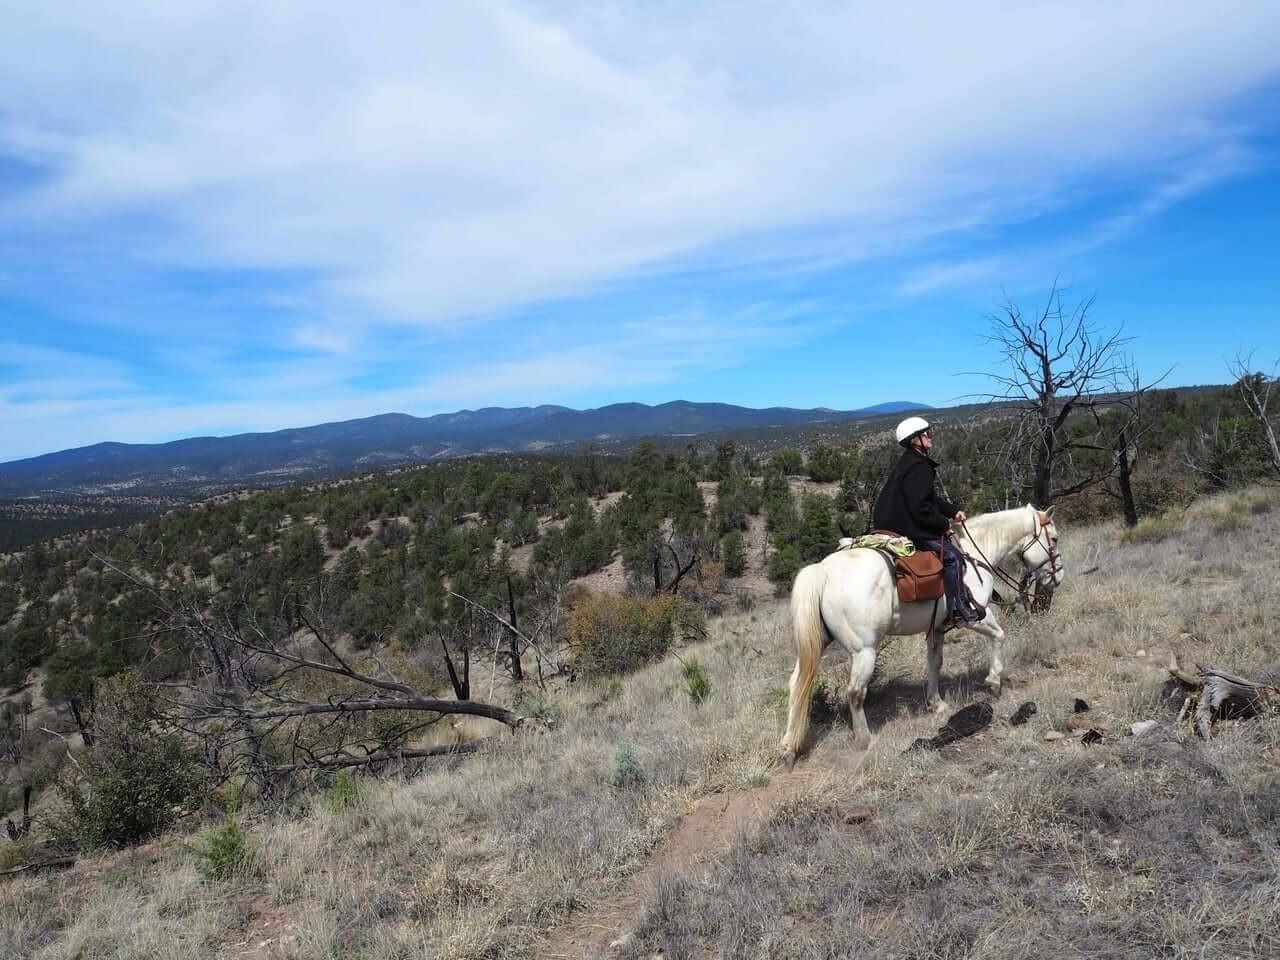 trail_riding_45-1.jpg